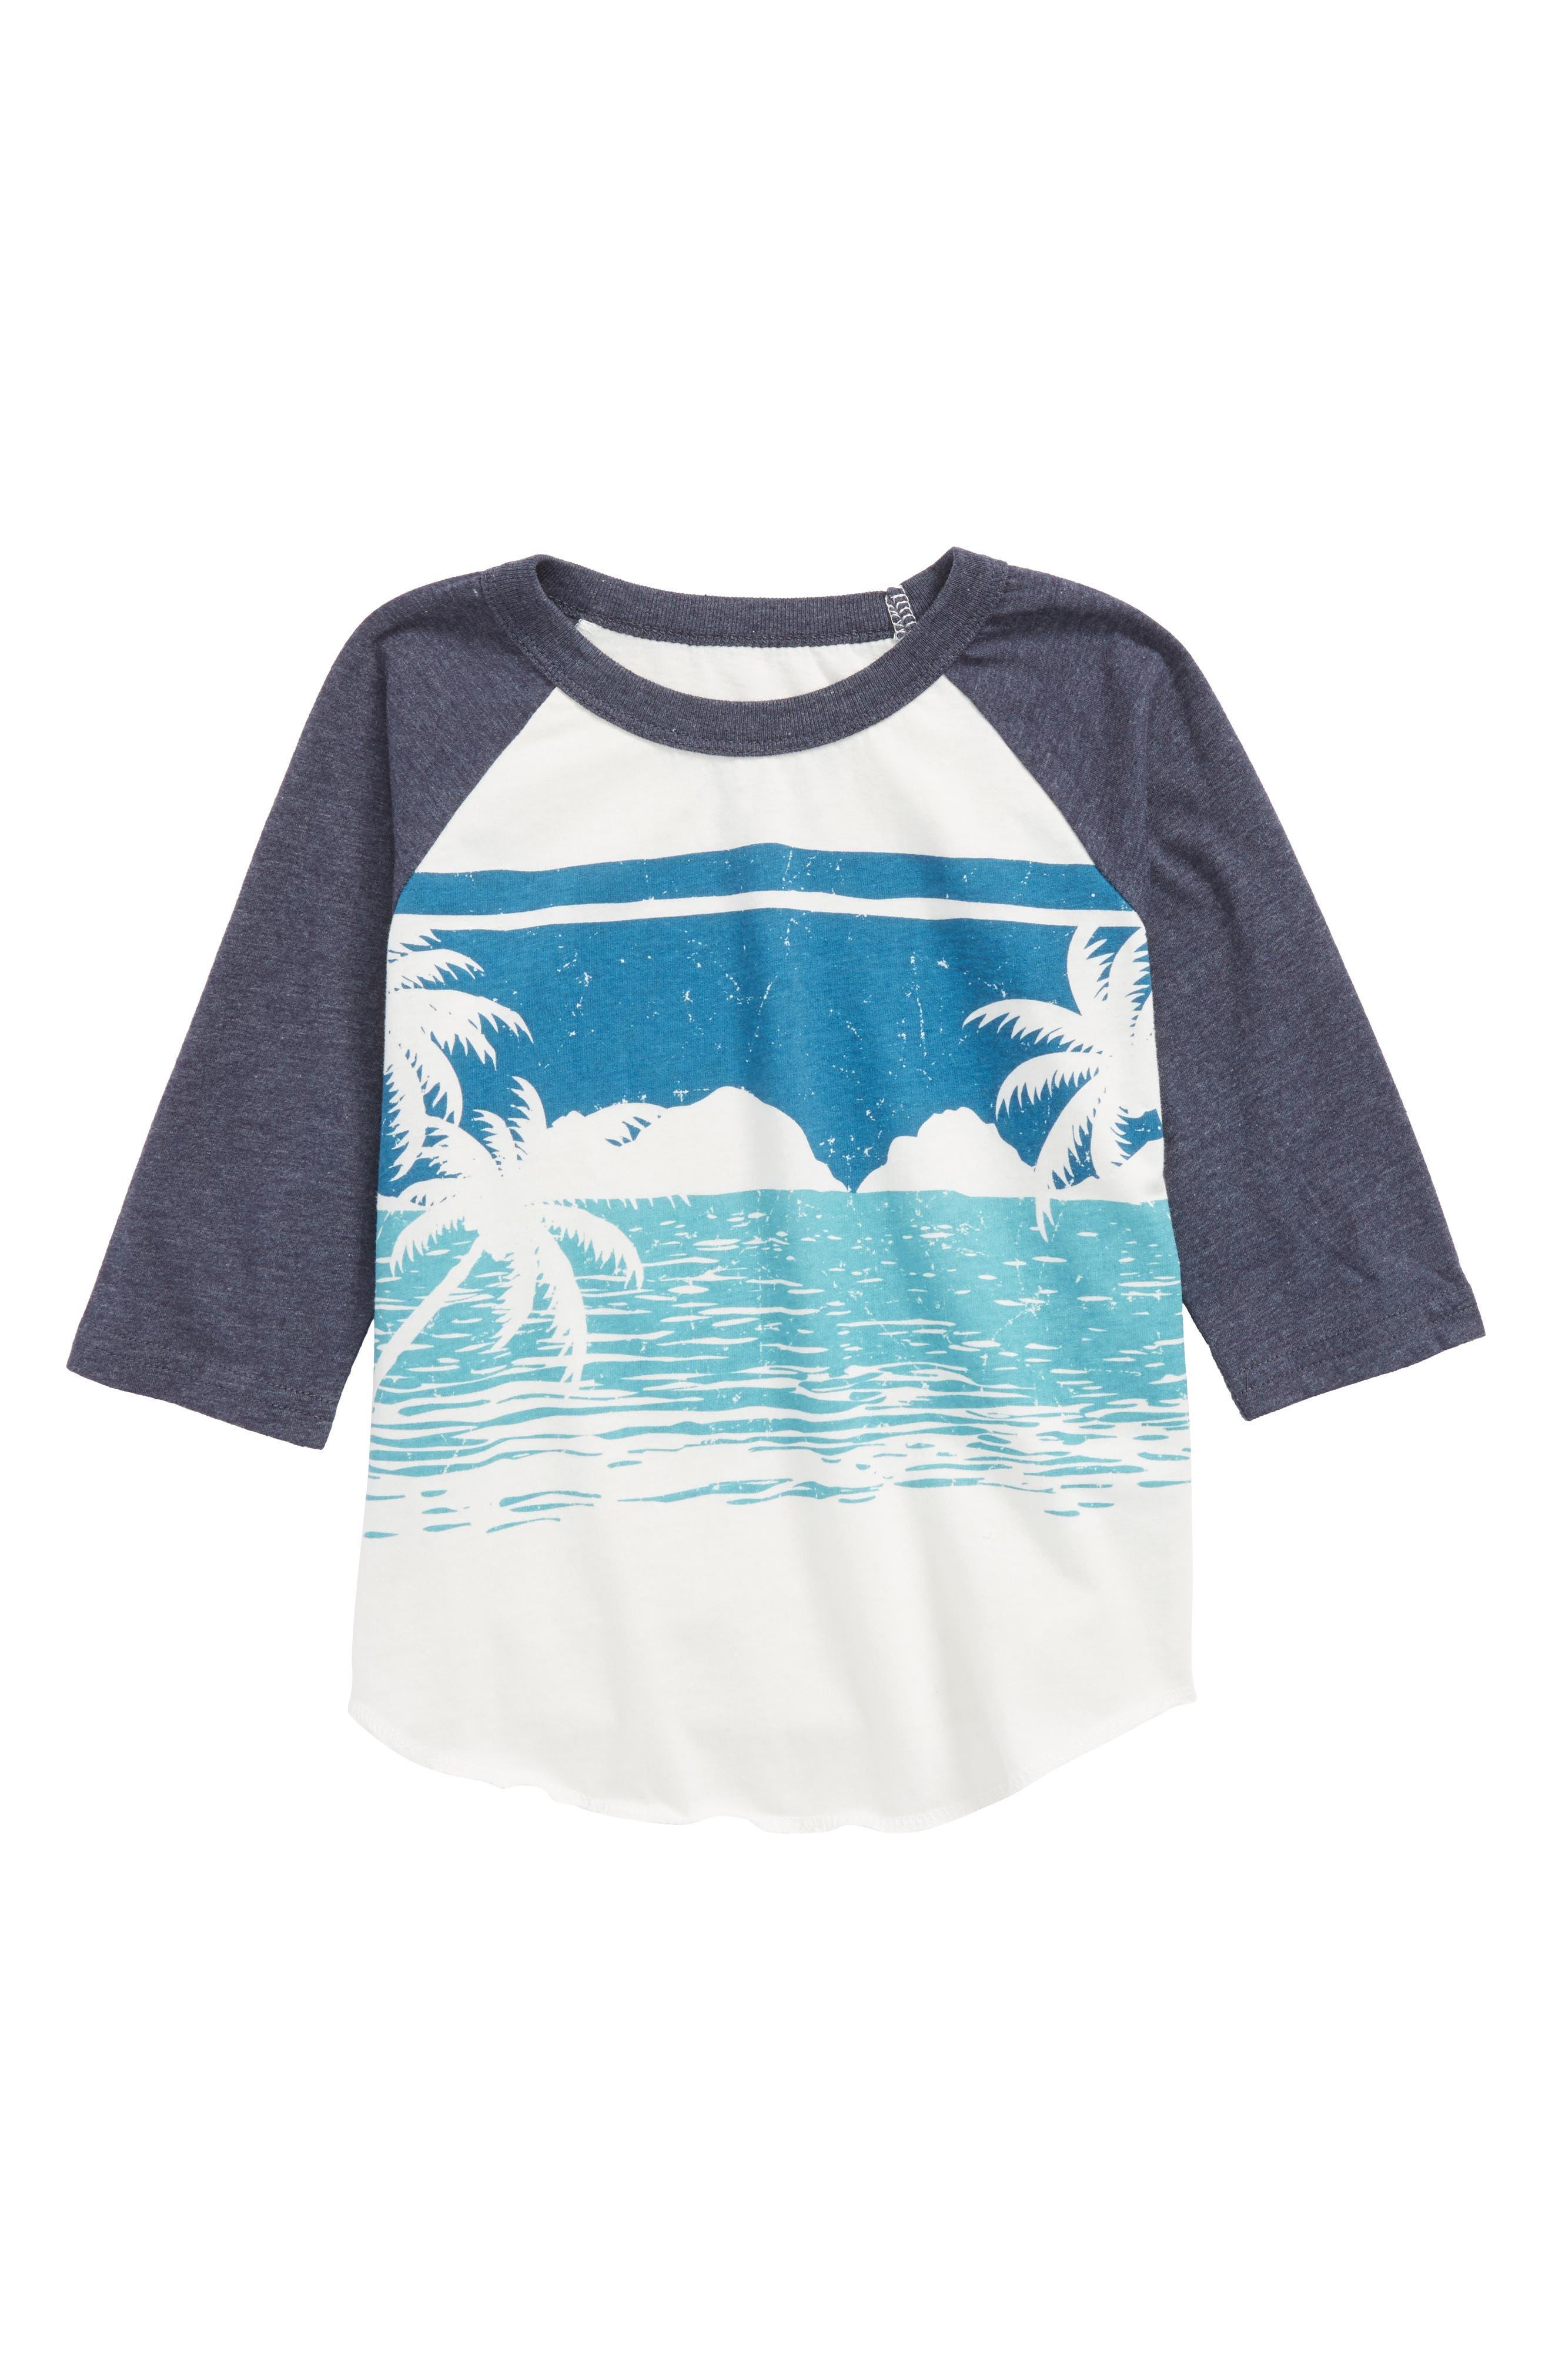 Alternate Image 1 Selected - Chaser Ocean View Raglan T-Shirt (Toddler Boys, Little Boys & Big Boys)